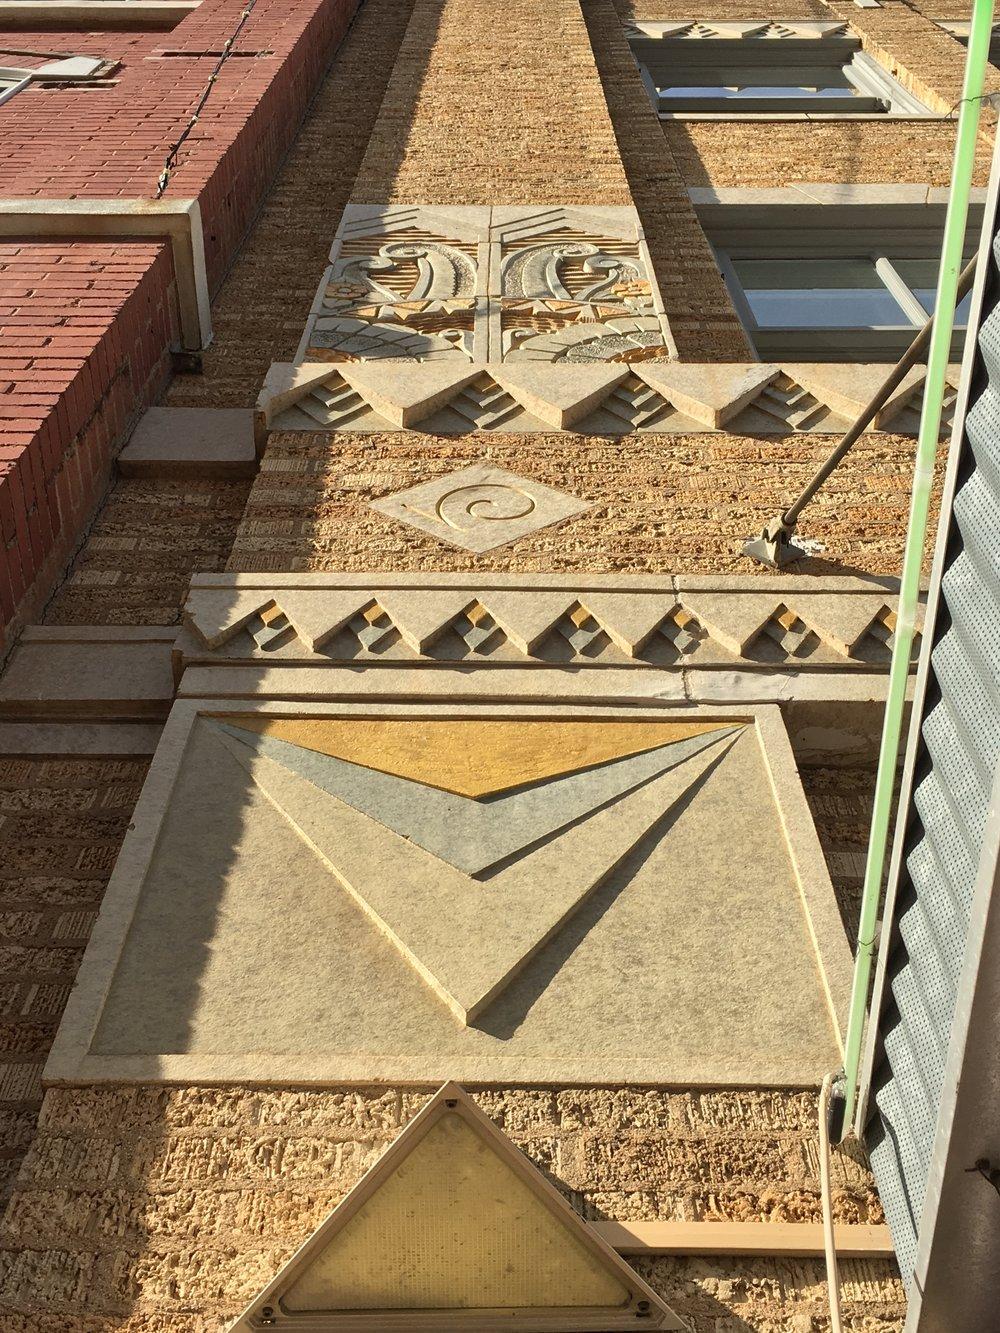 Architecture at Sundance Square, Fort Worth, TX